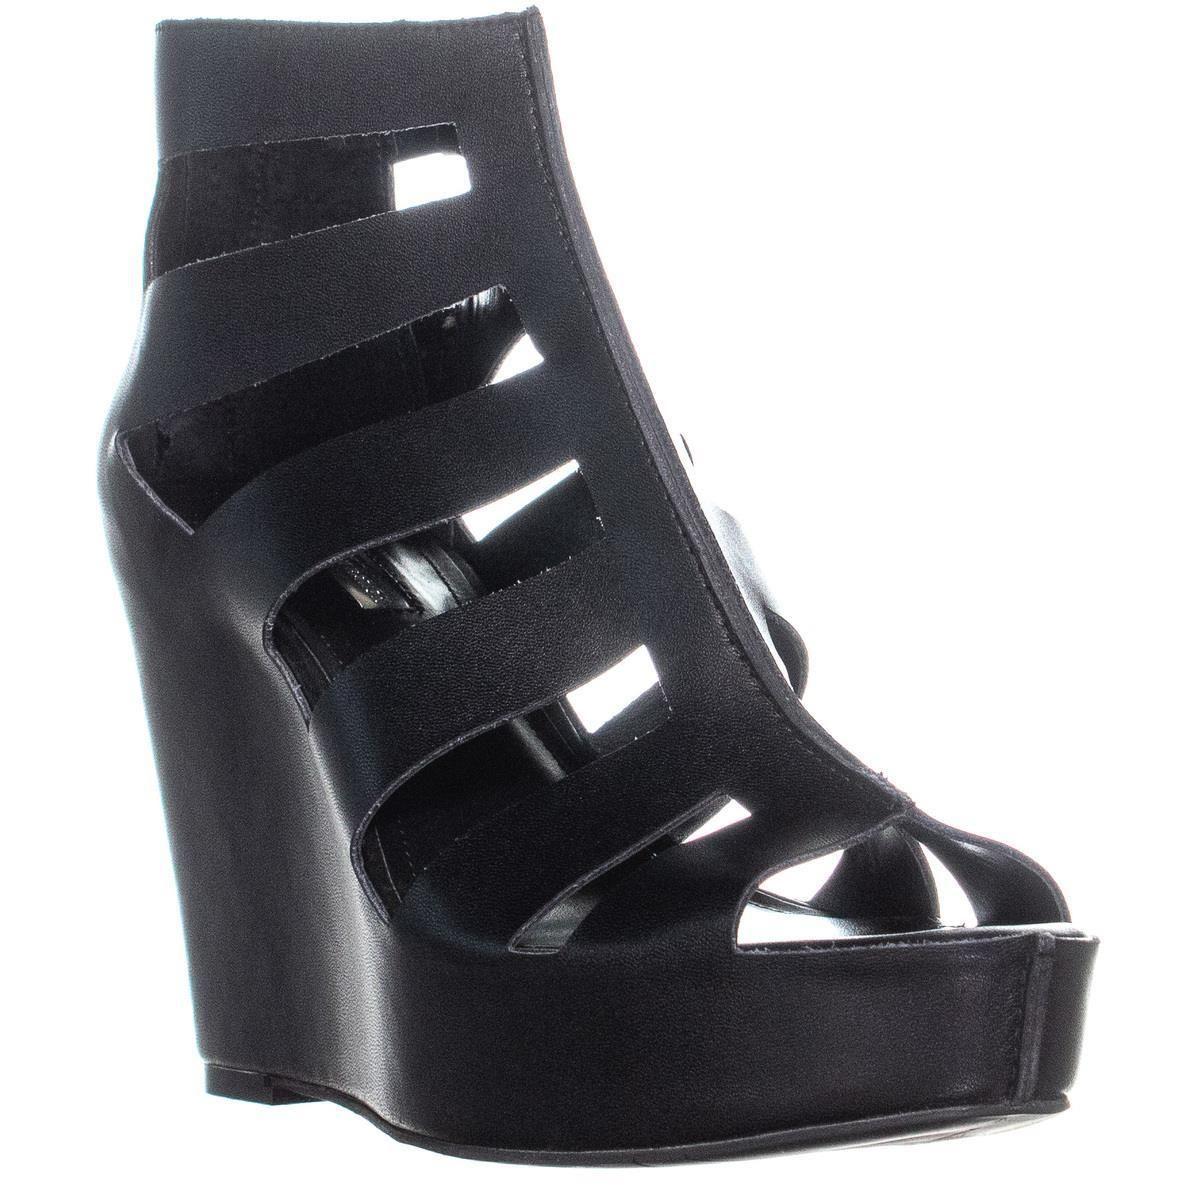 20cf9112a5 Lyst - BCBGeneration Torrez Platform Wedge Sandals in Black - Save 13%